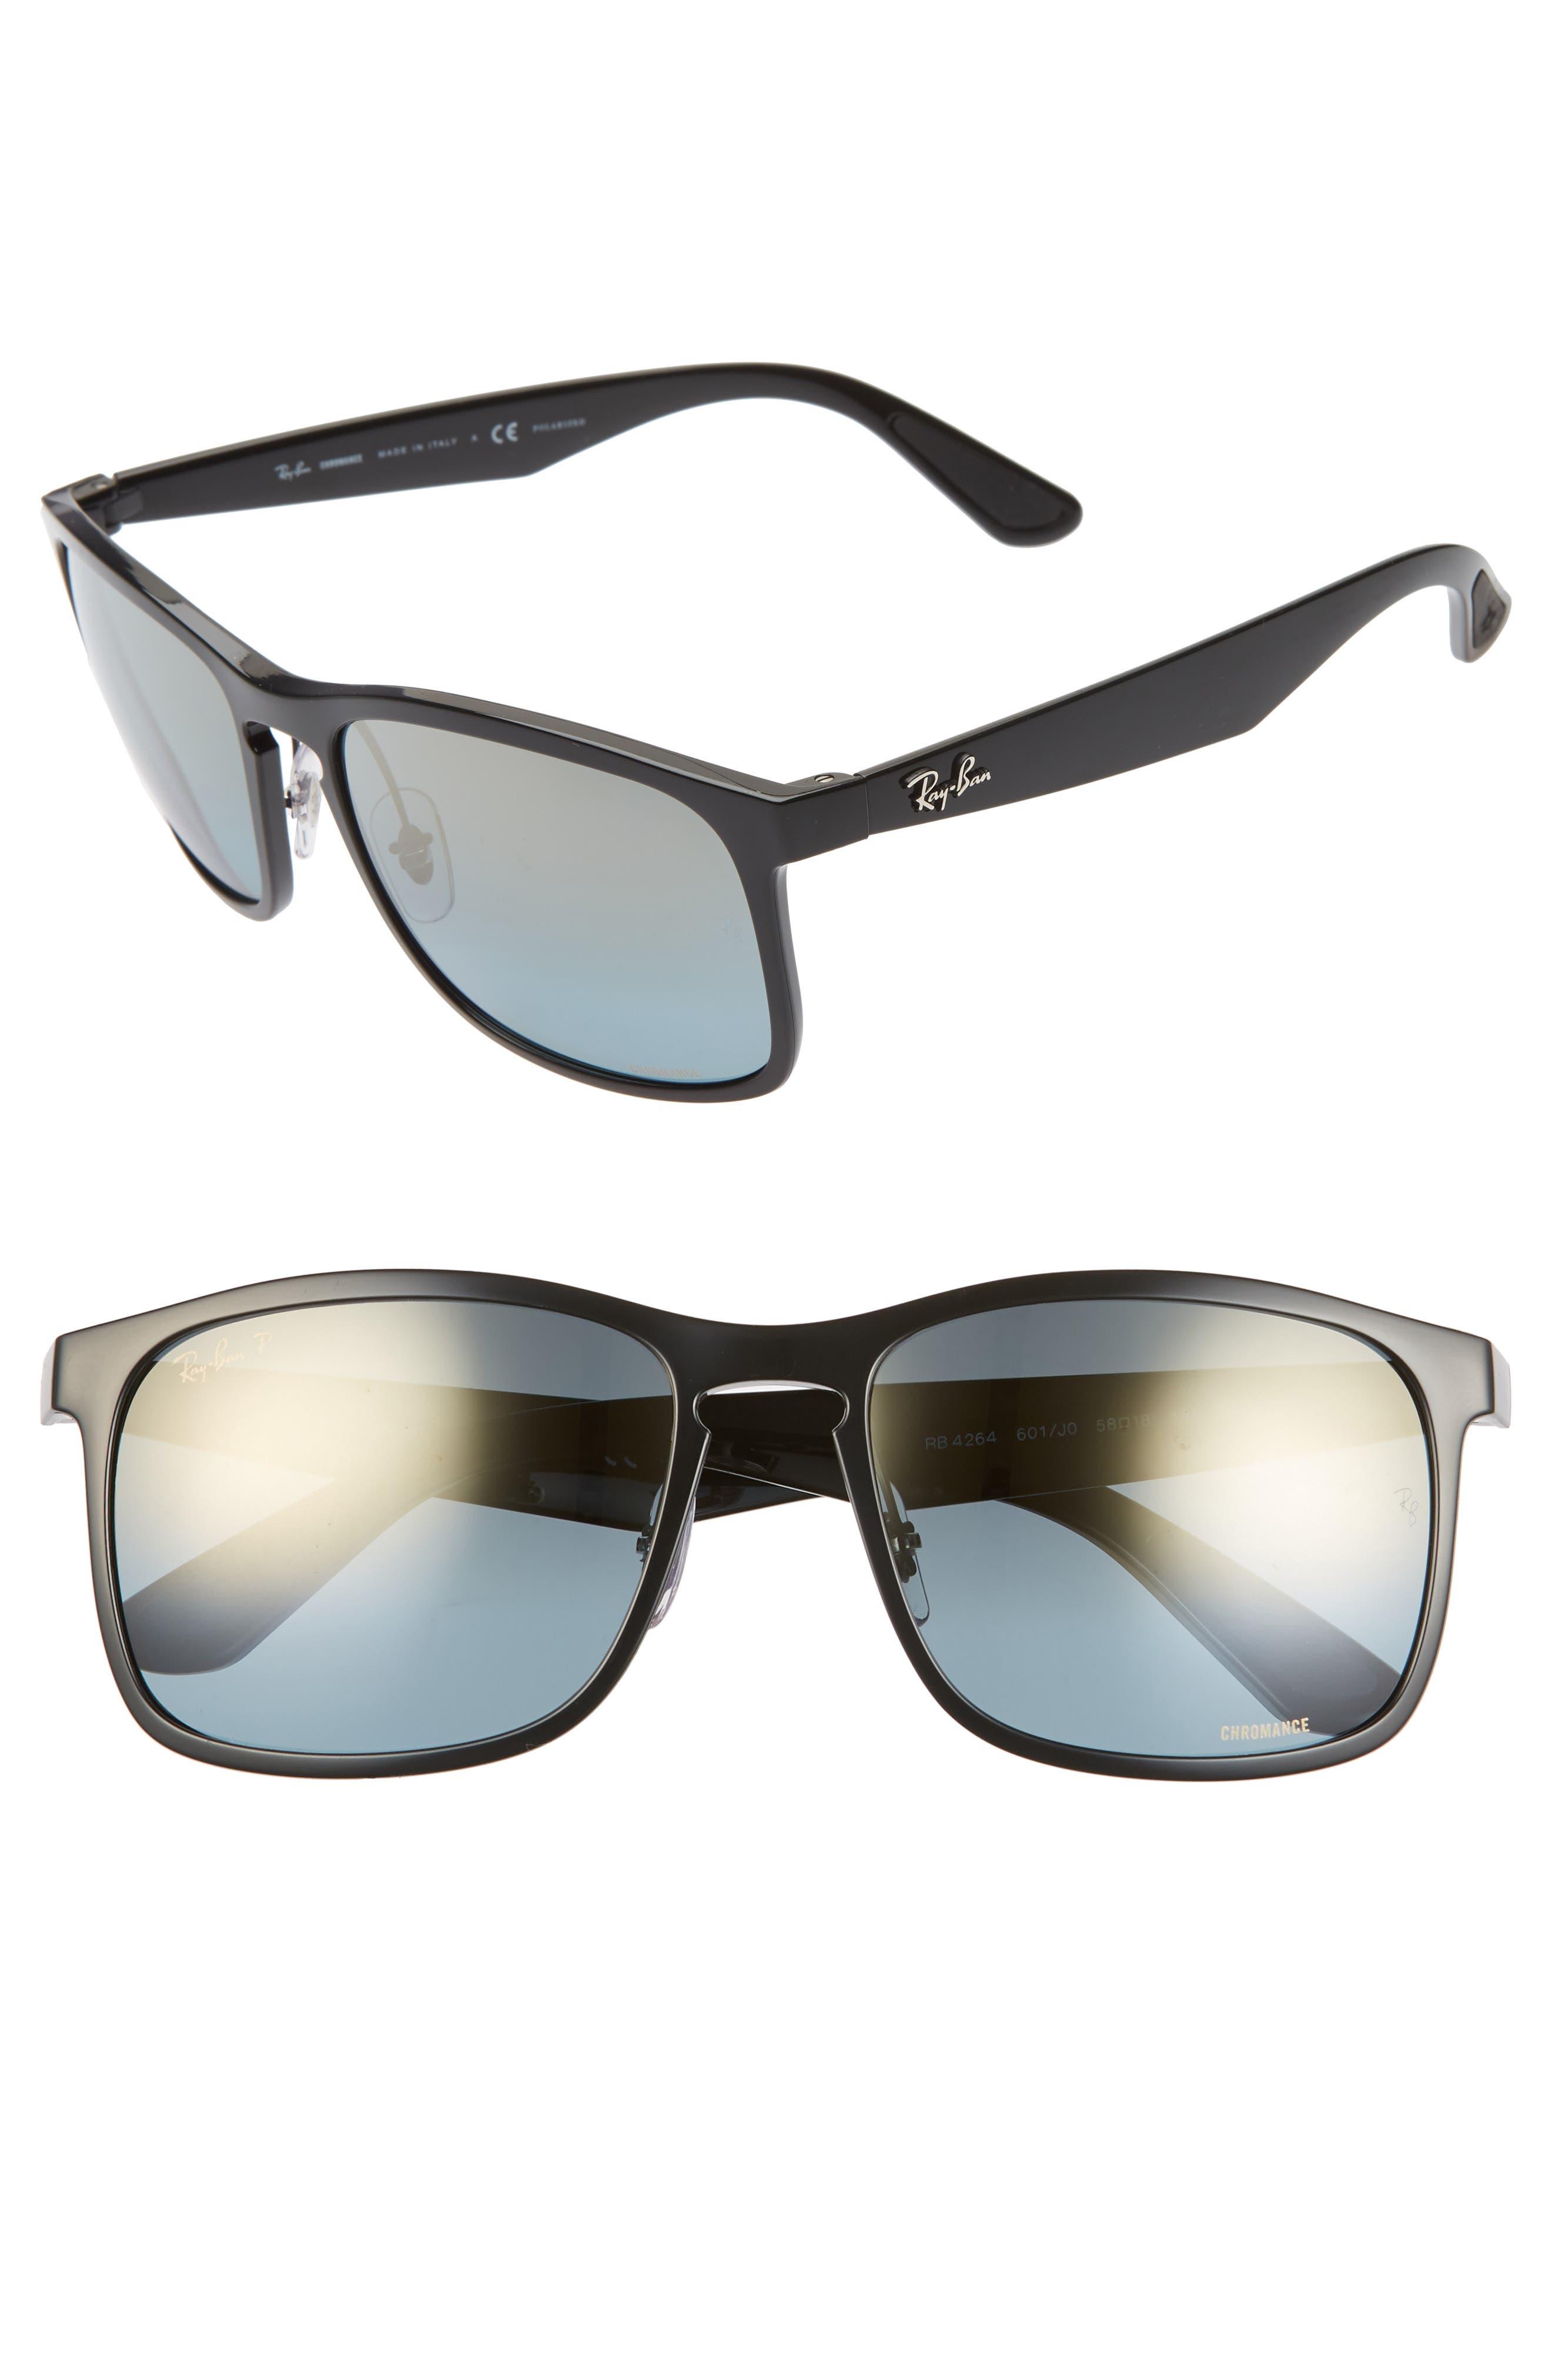 Ray-Ban Tech 62Mm Polarized Wayfarer Sunglasses - Black Gradient Mirror